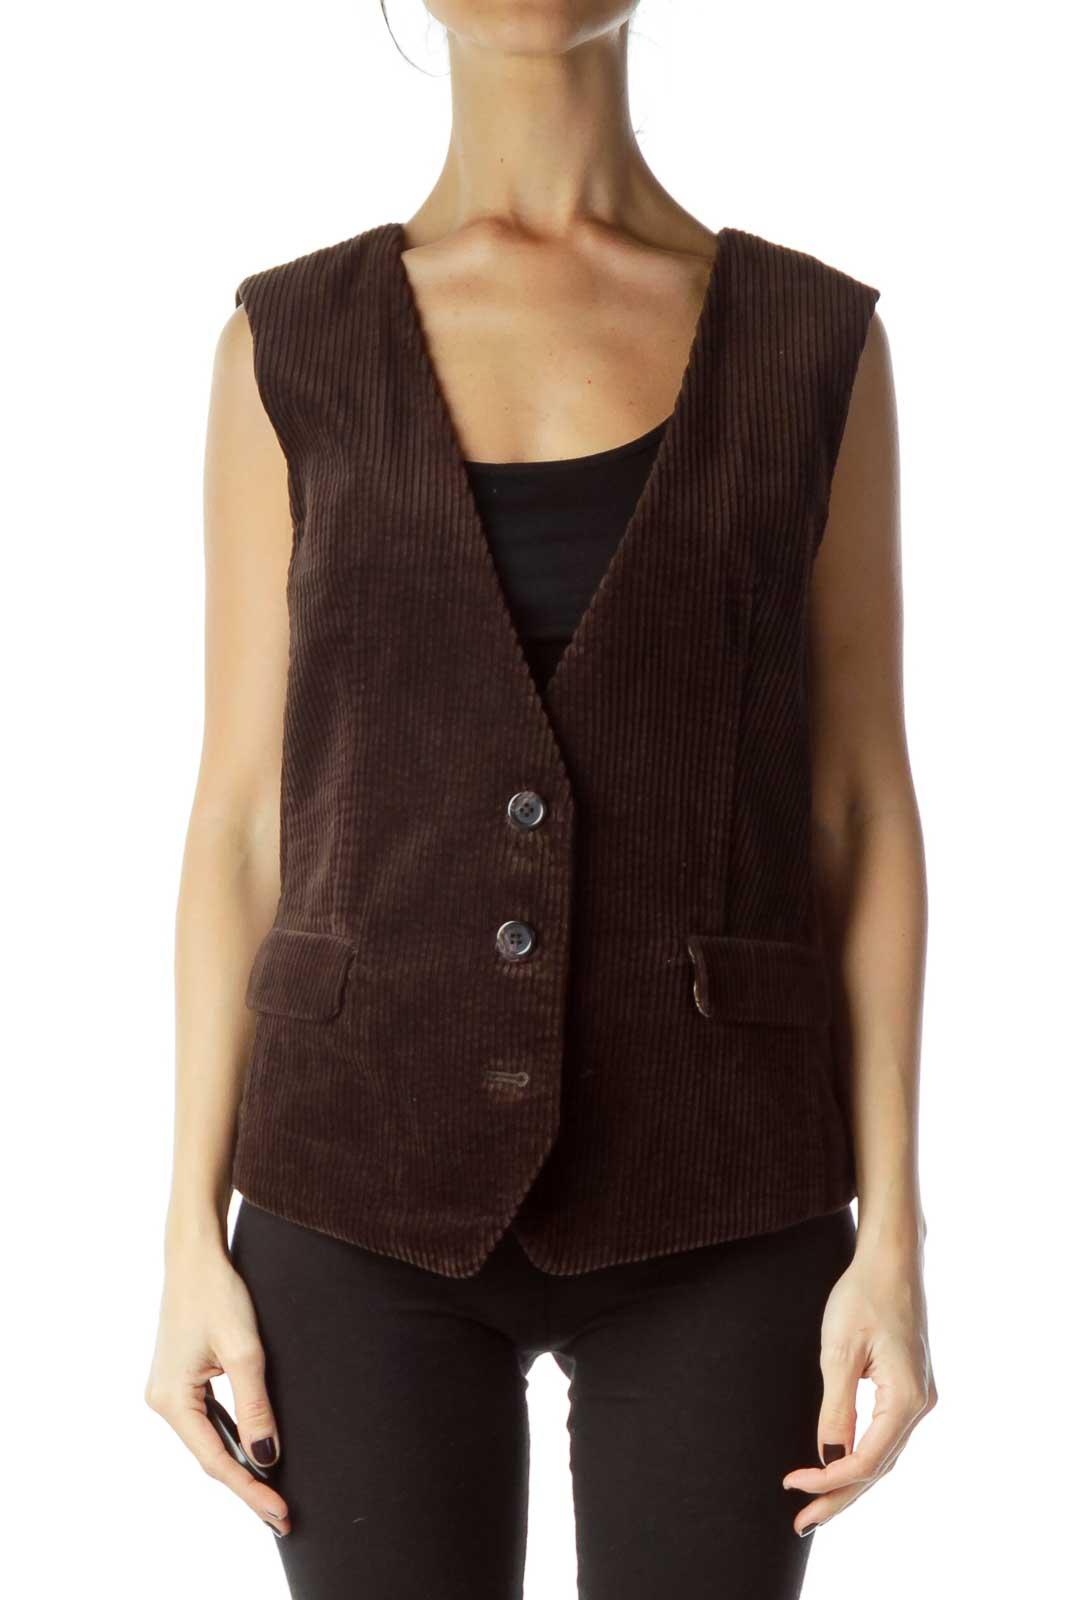 Brown Corduroy Velvet Vest